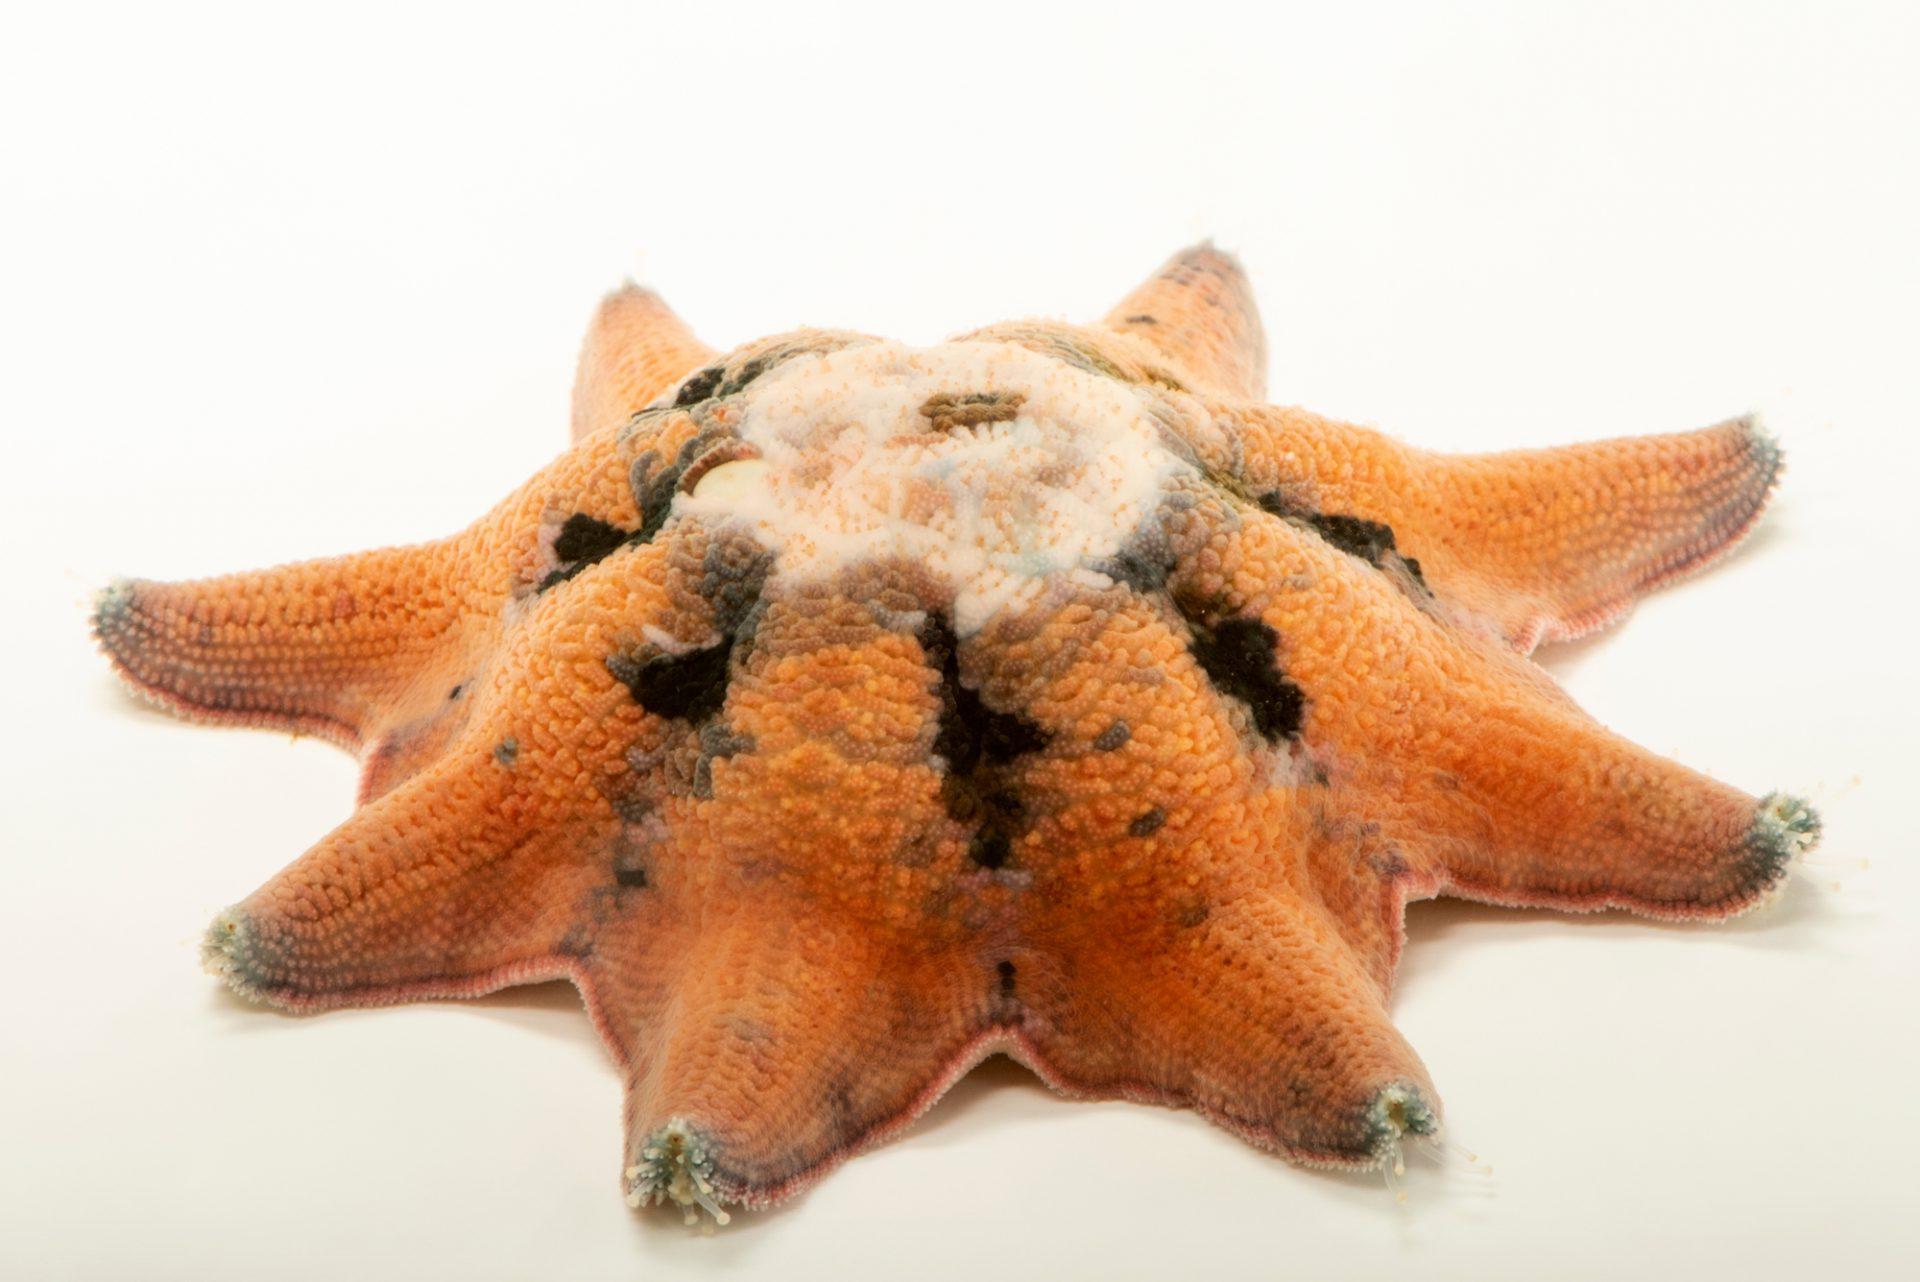 Photo: Spurred sea star (Meridiastra calcar) at Melbourne Zoo.